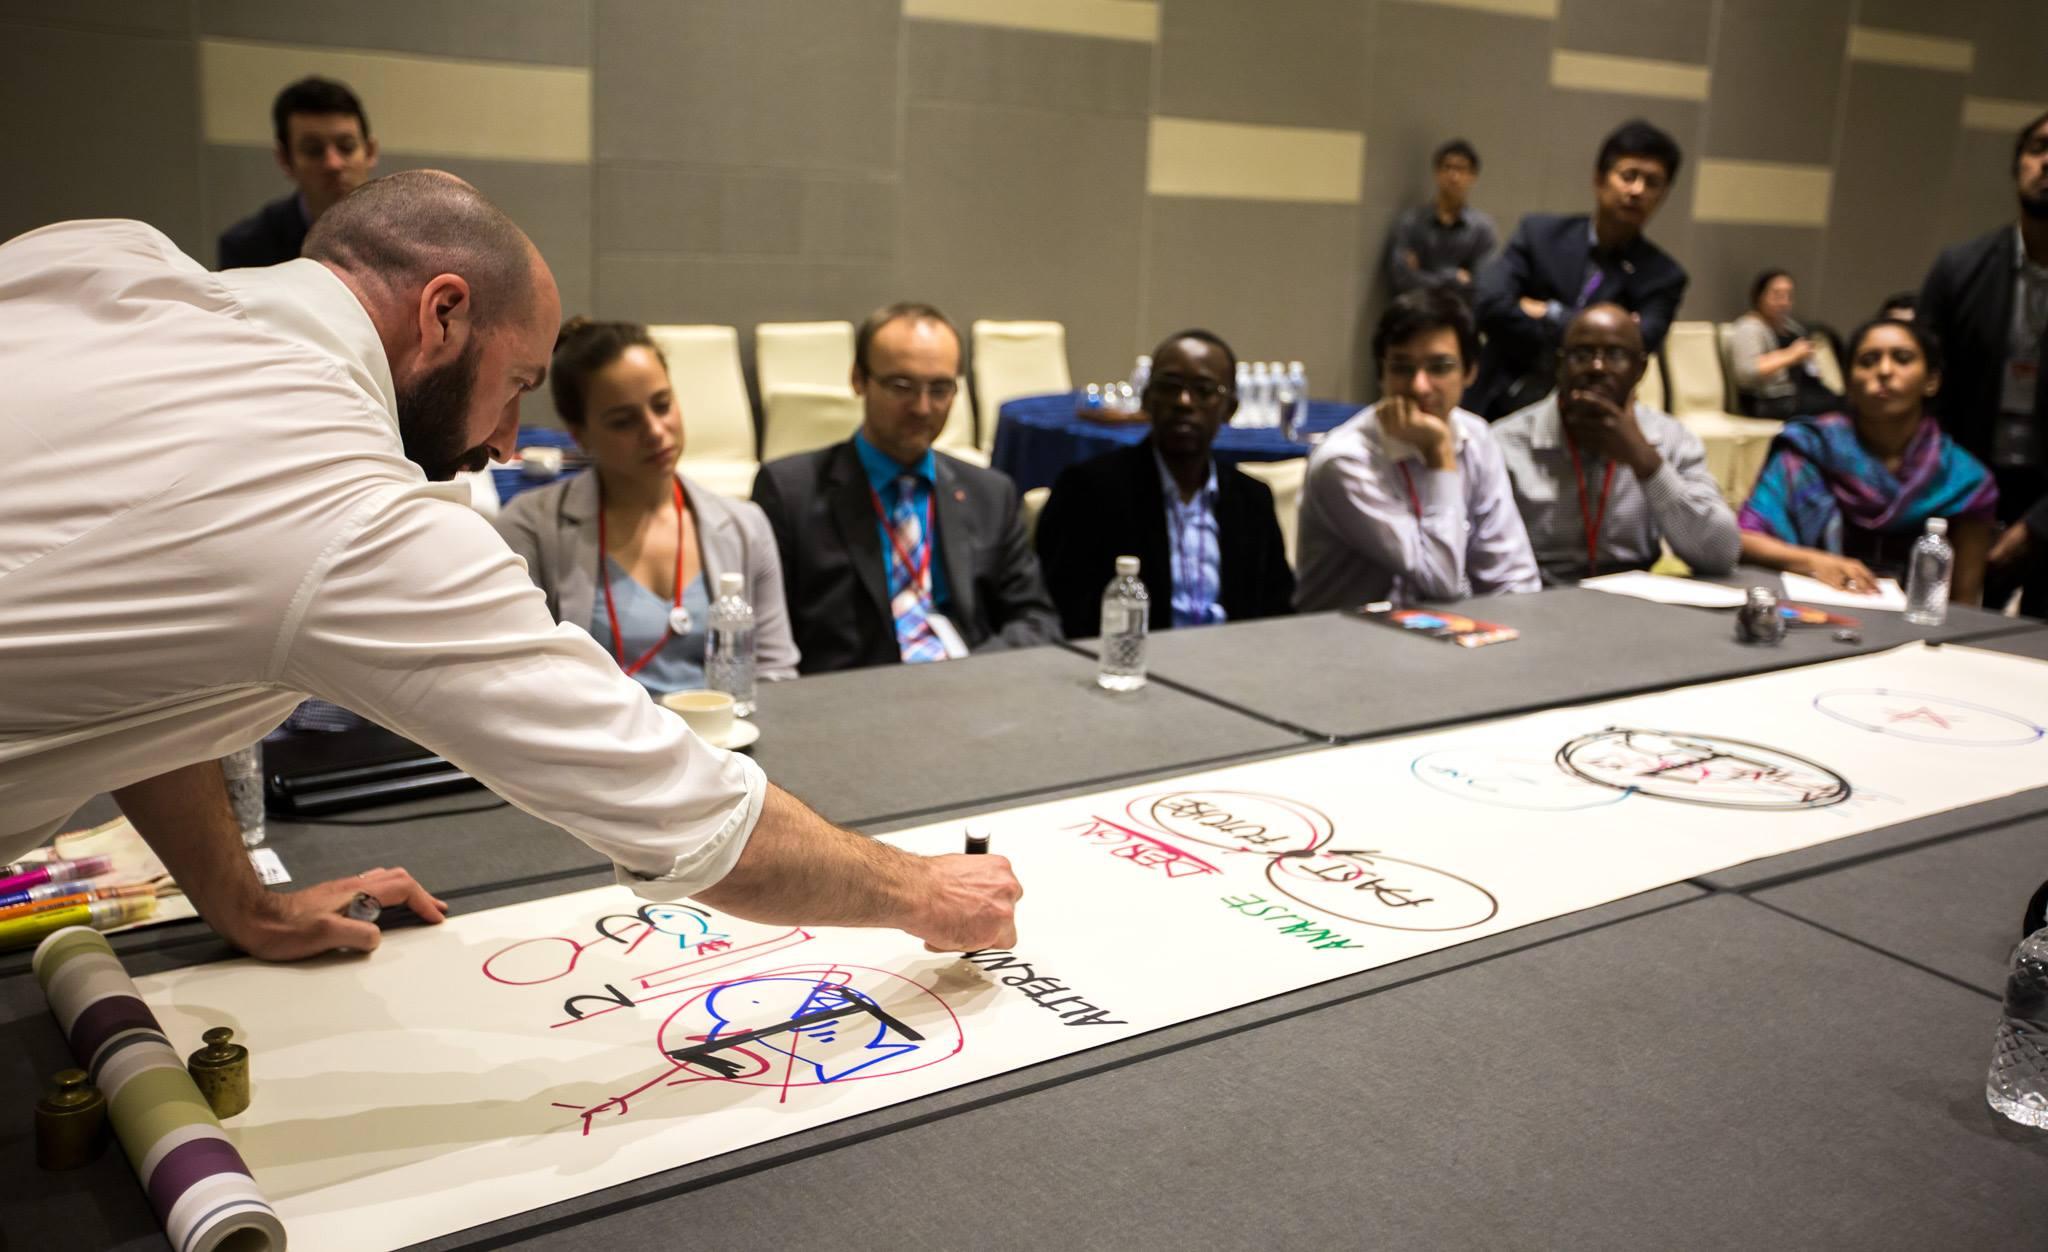 socialnetlink workshop Paul Hughes